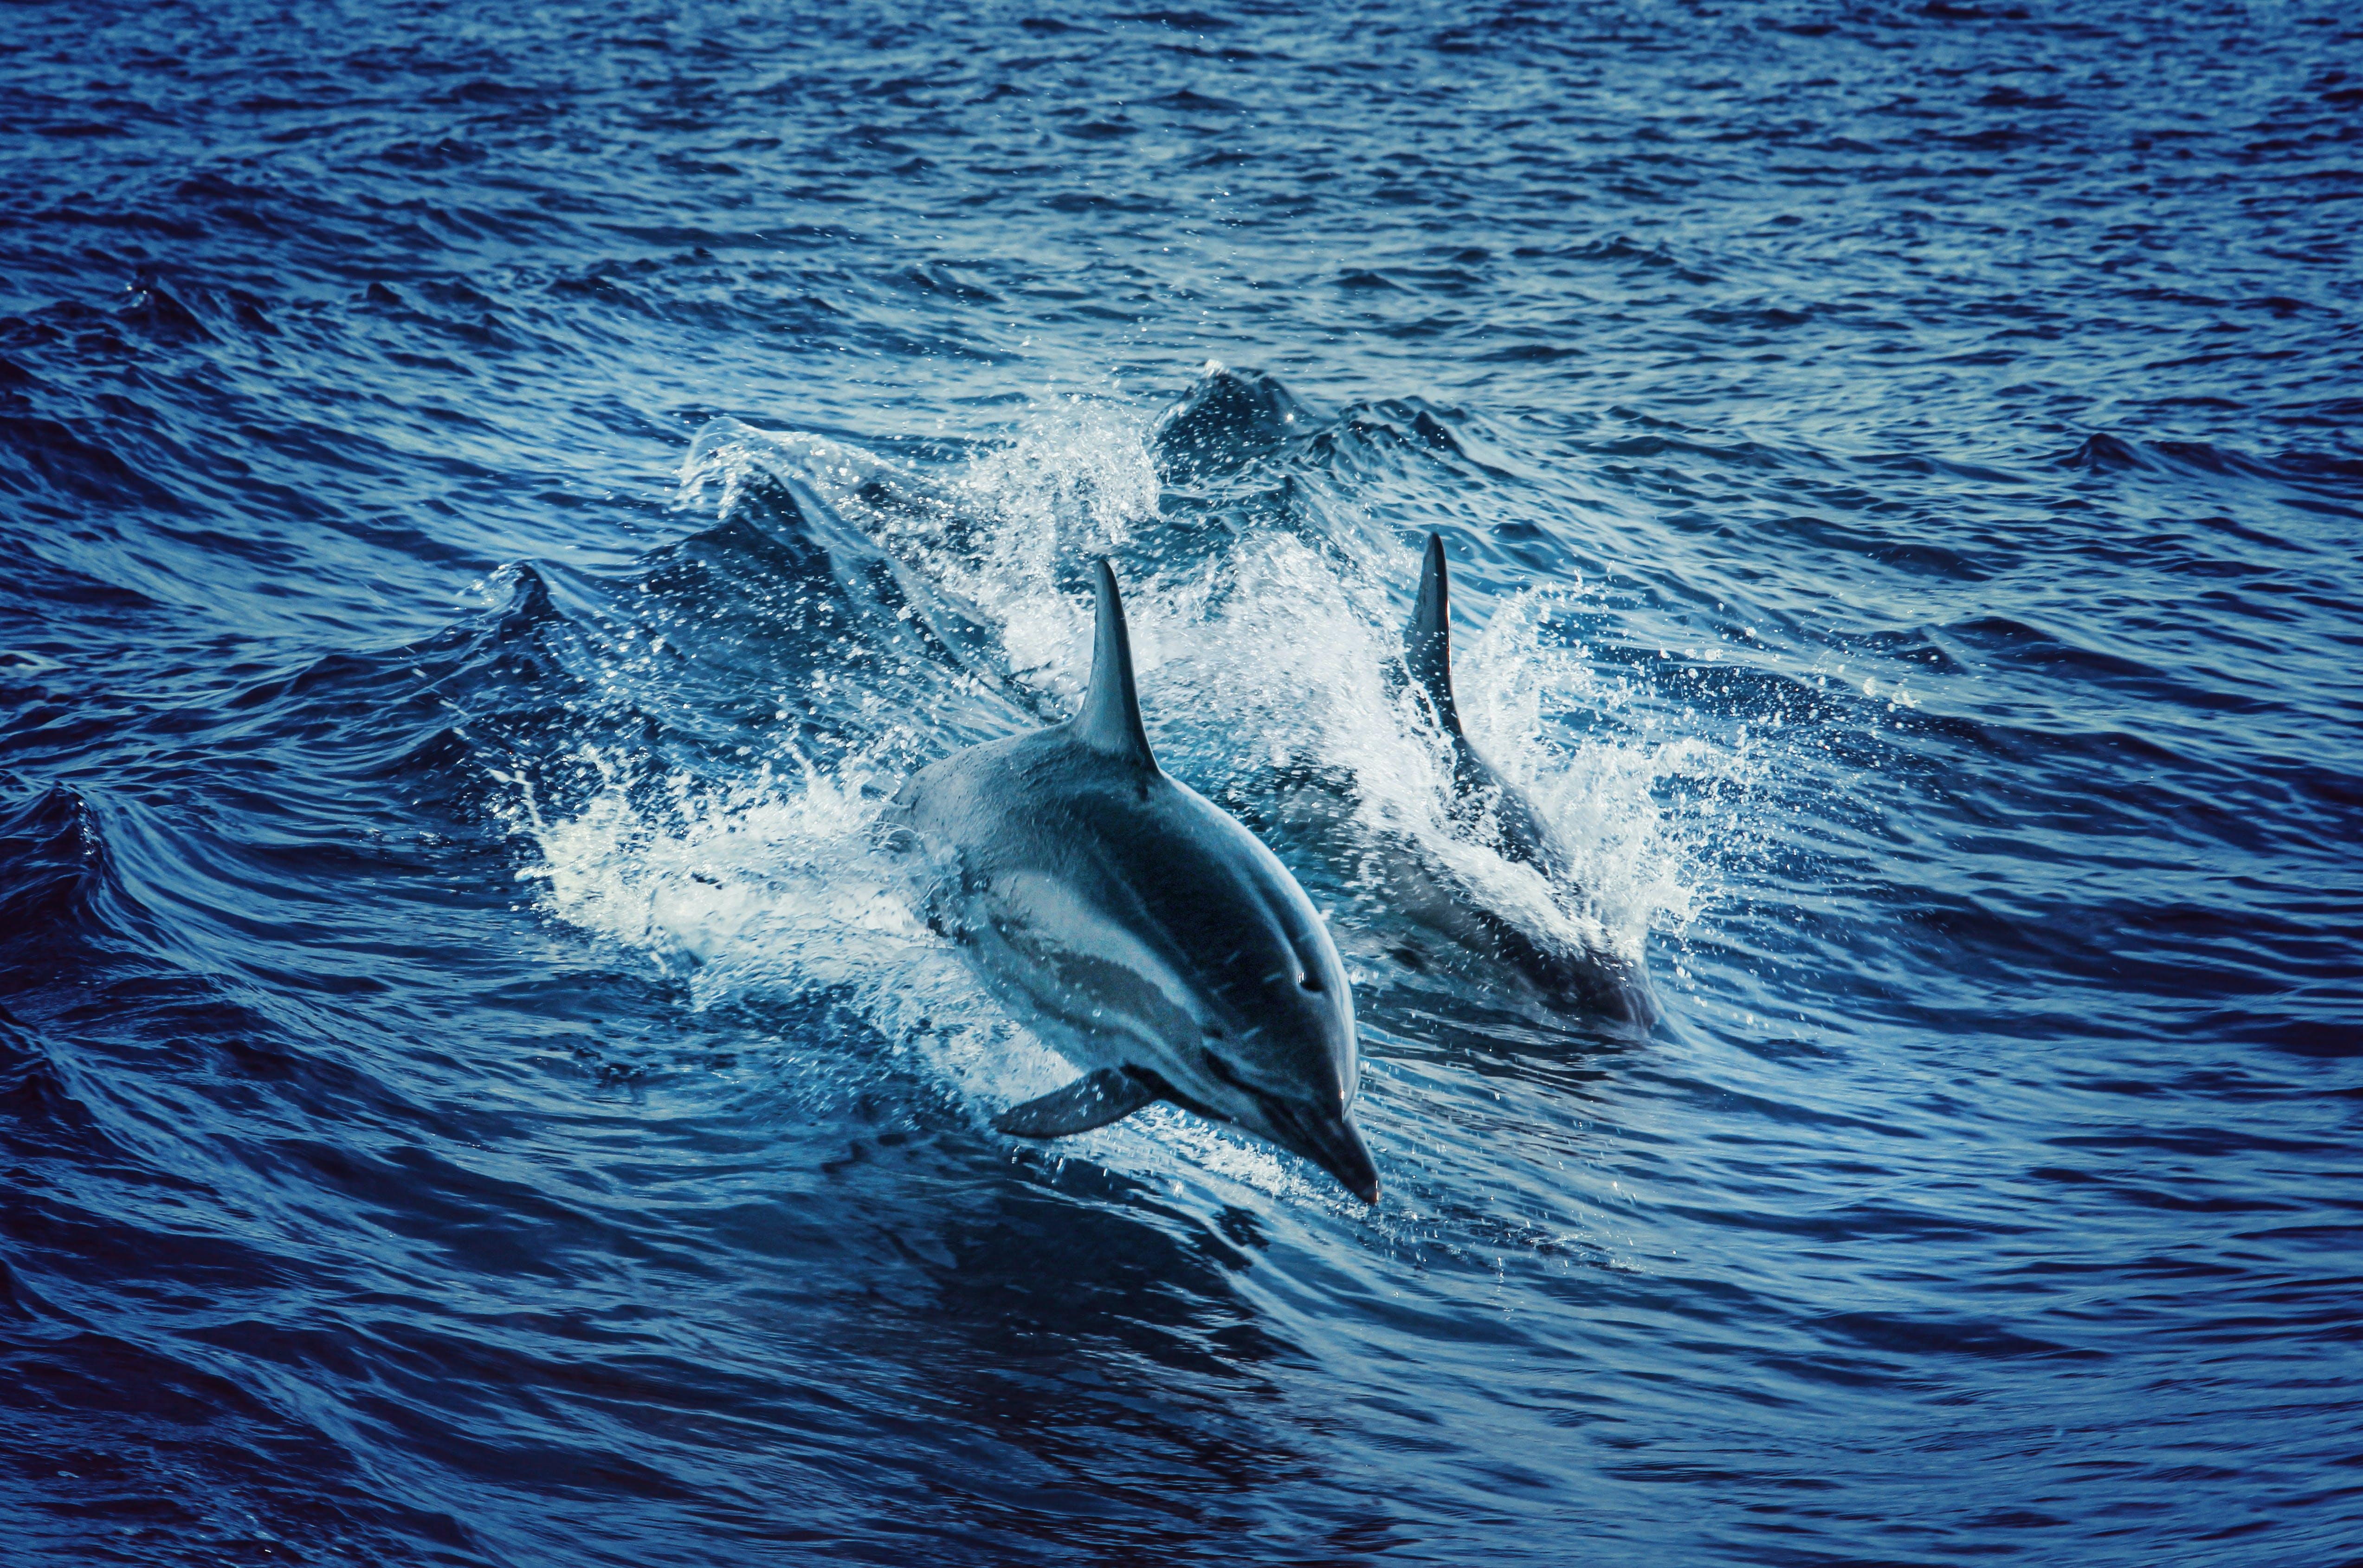 Kostenloses Stock Foto zu baden, bewegung, delfine, delphin